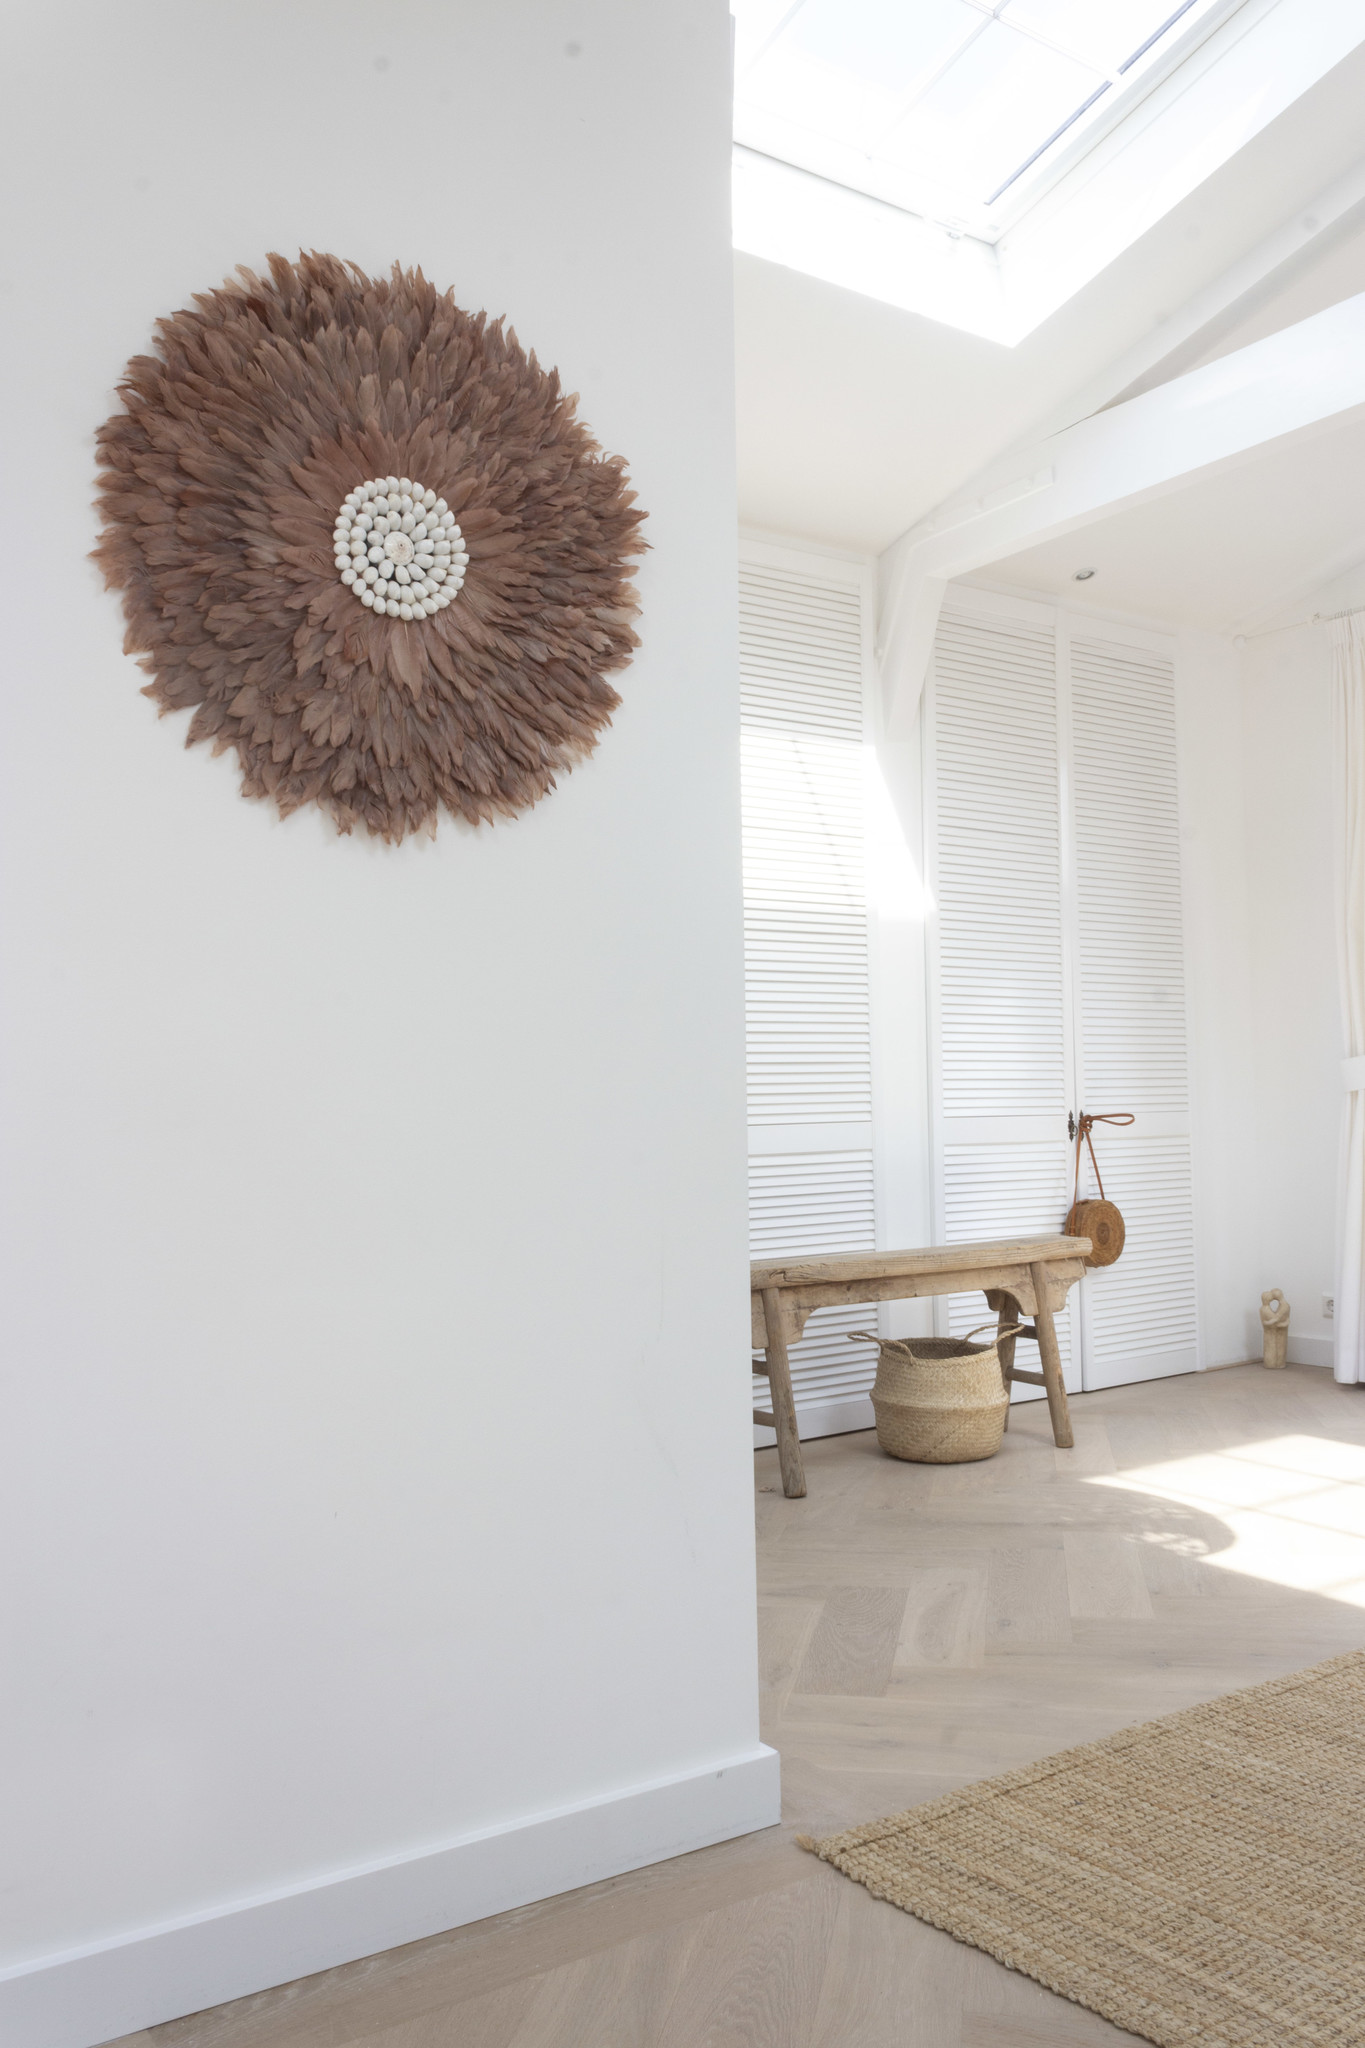 Juju wanddecoratie bruin